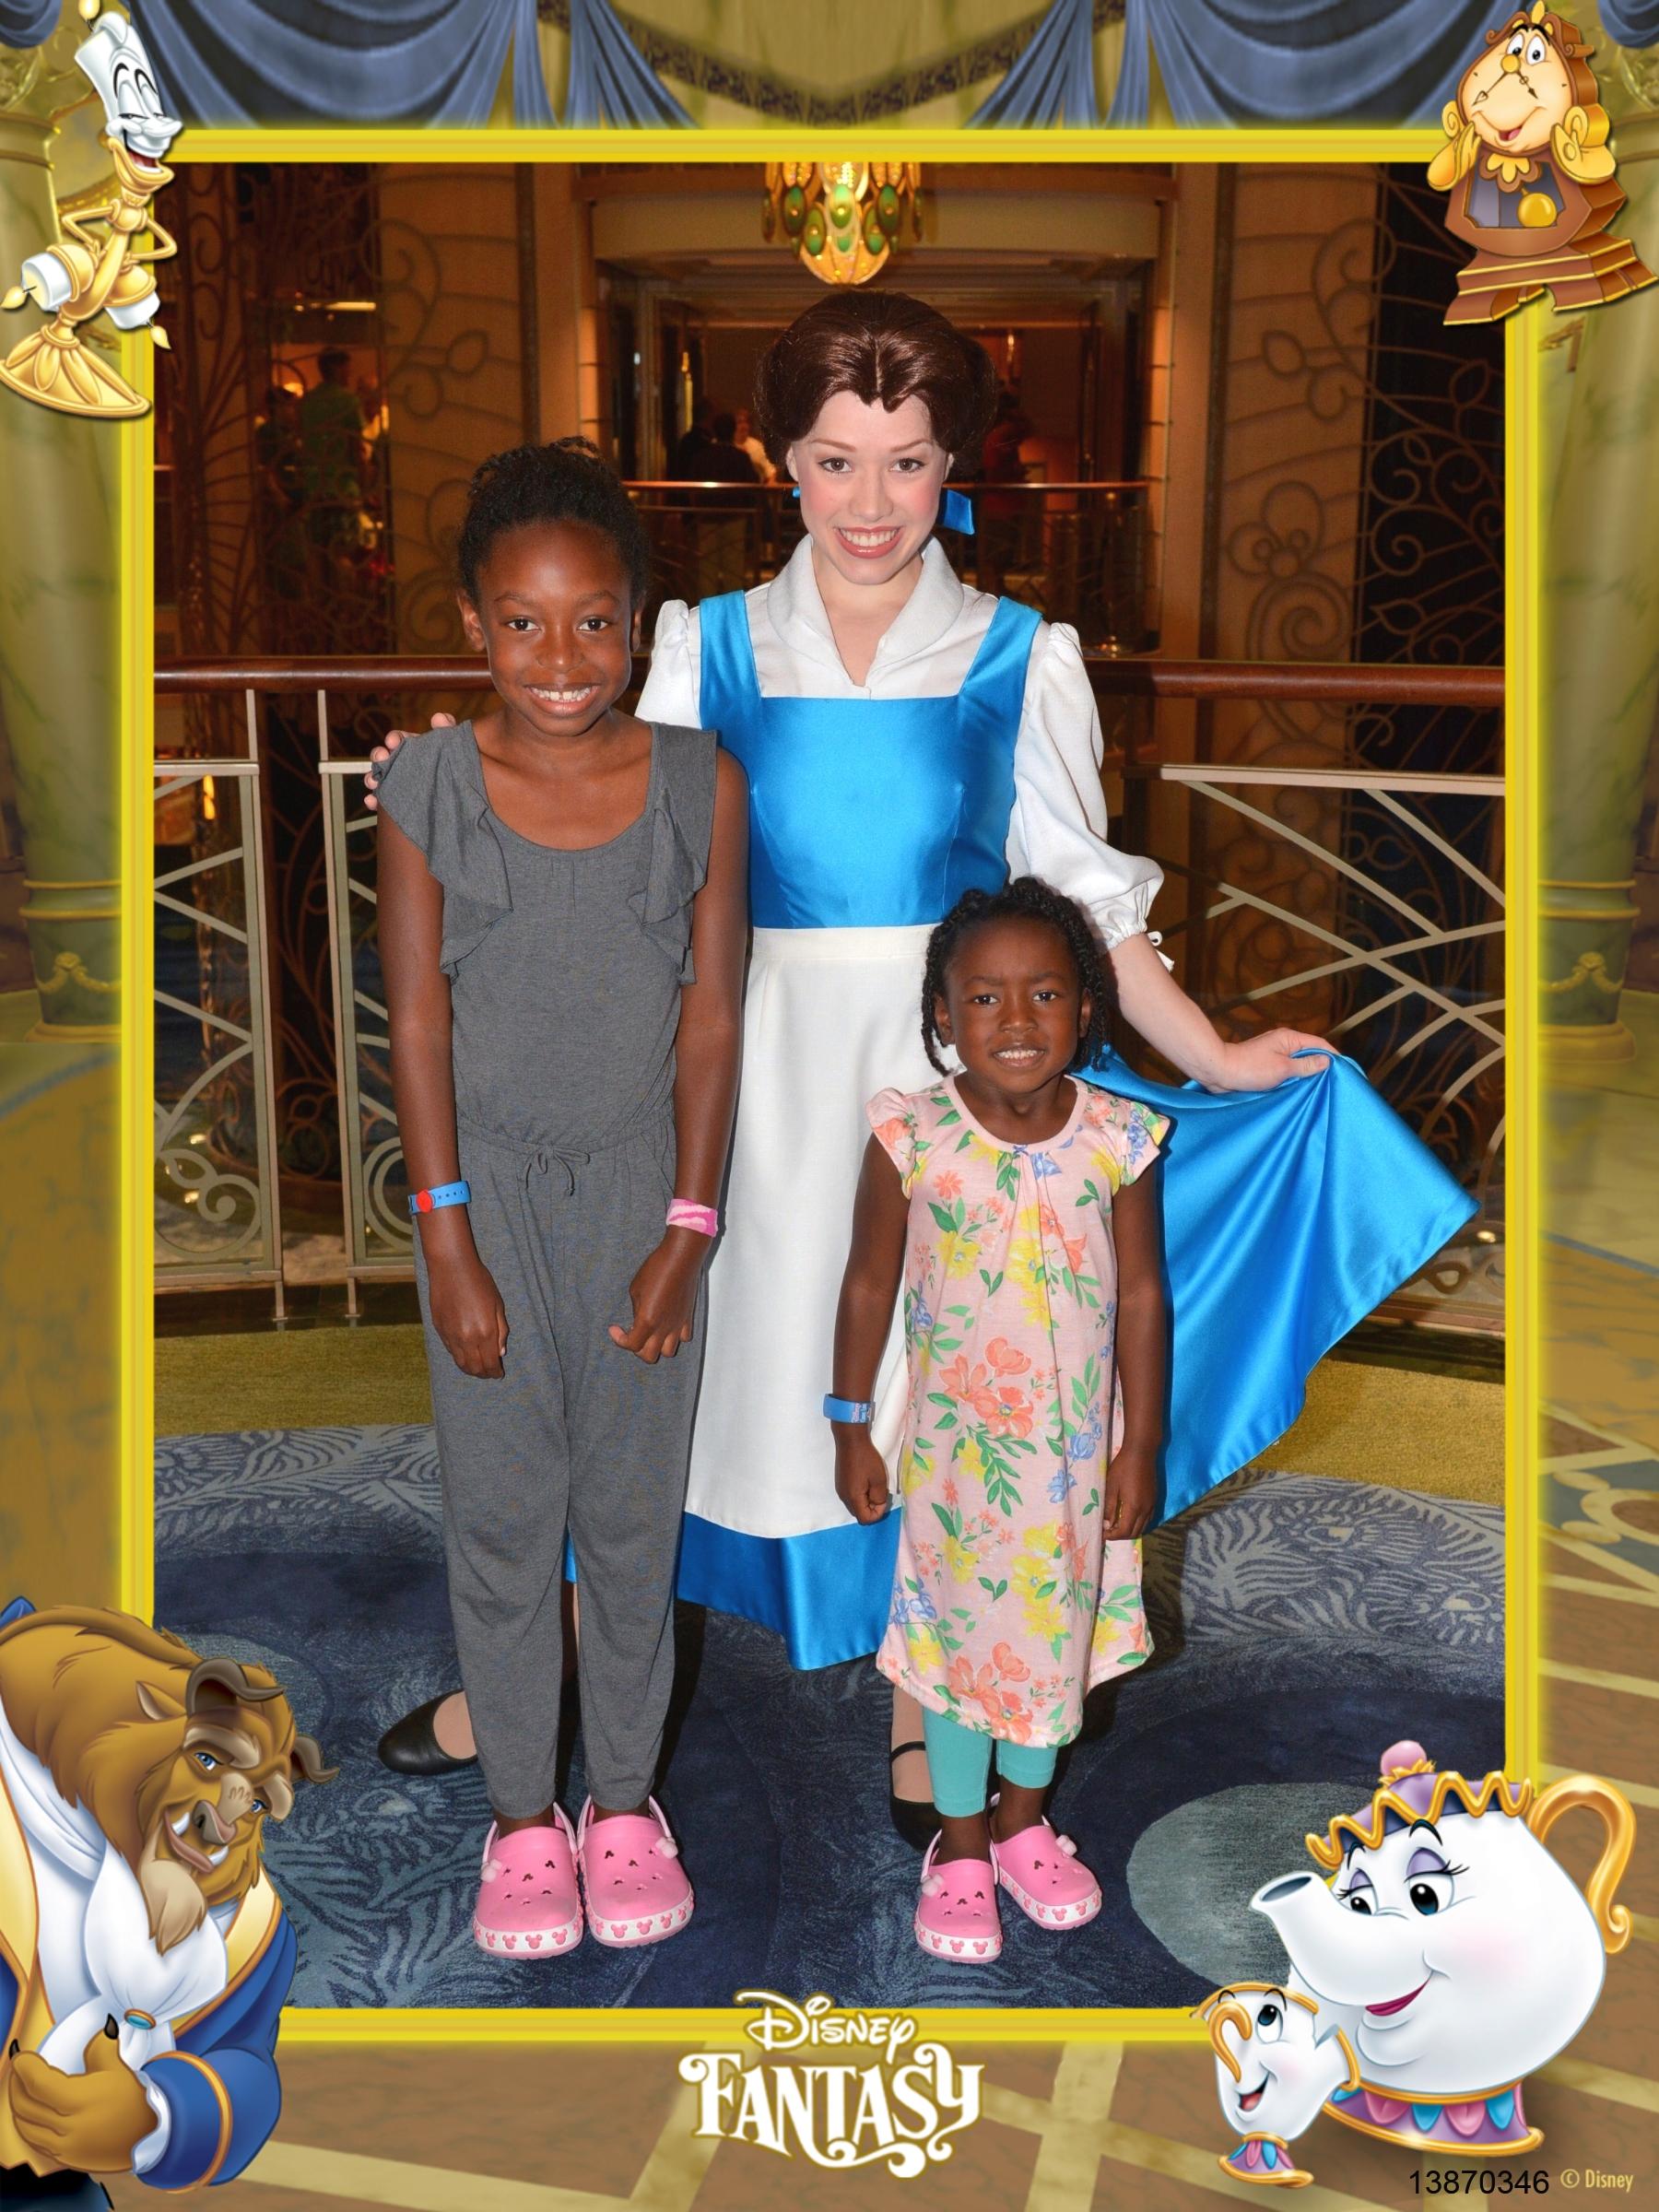 213-13870346-Princesses Belle 4 M-17830_GPR